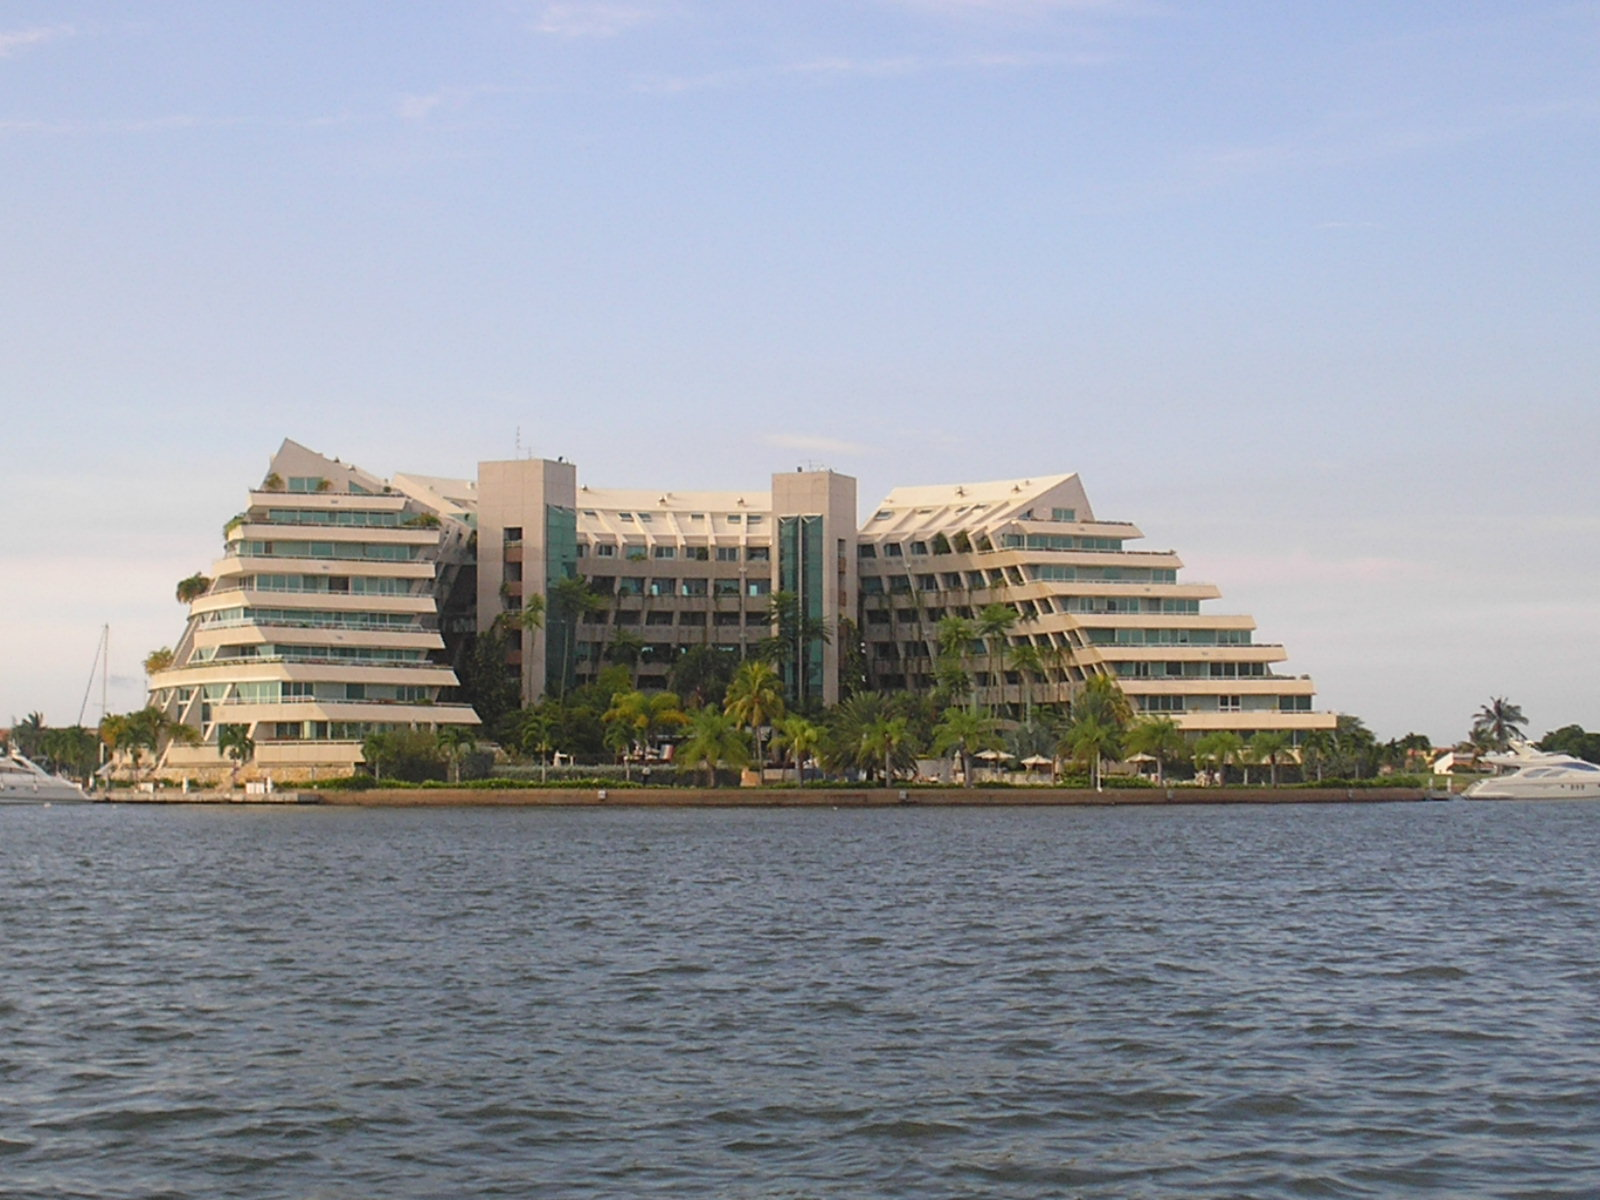 Archivo hotel en lecher a edo anzo tegui jpg wikipedia for Hoteles familiares en barcelona ciudad